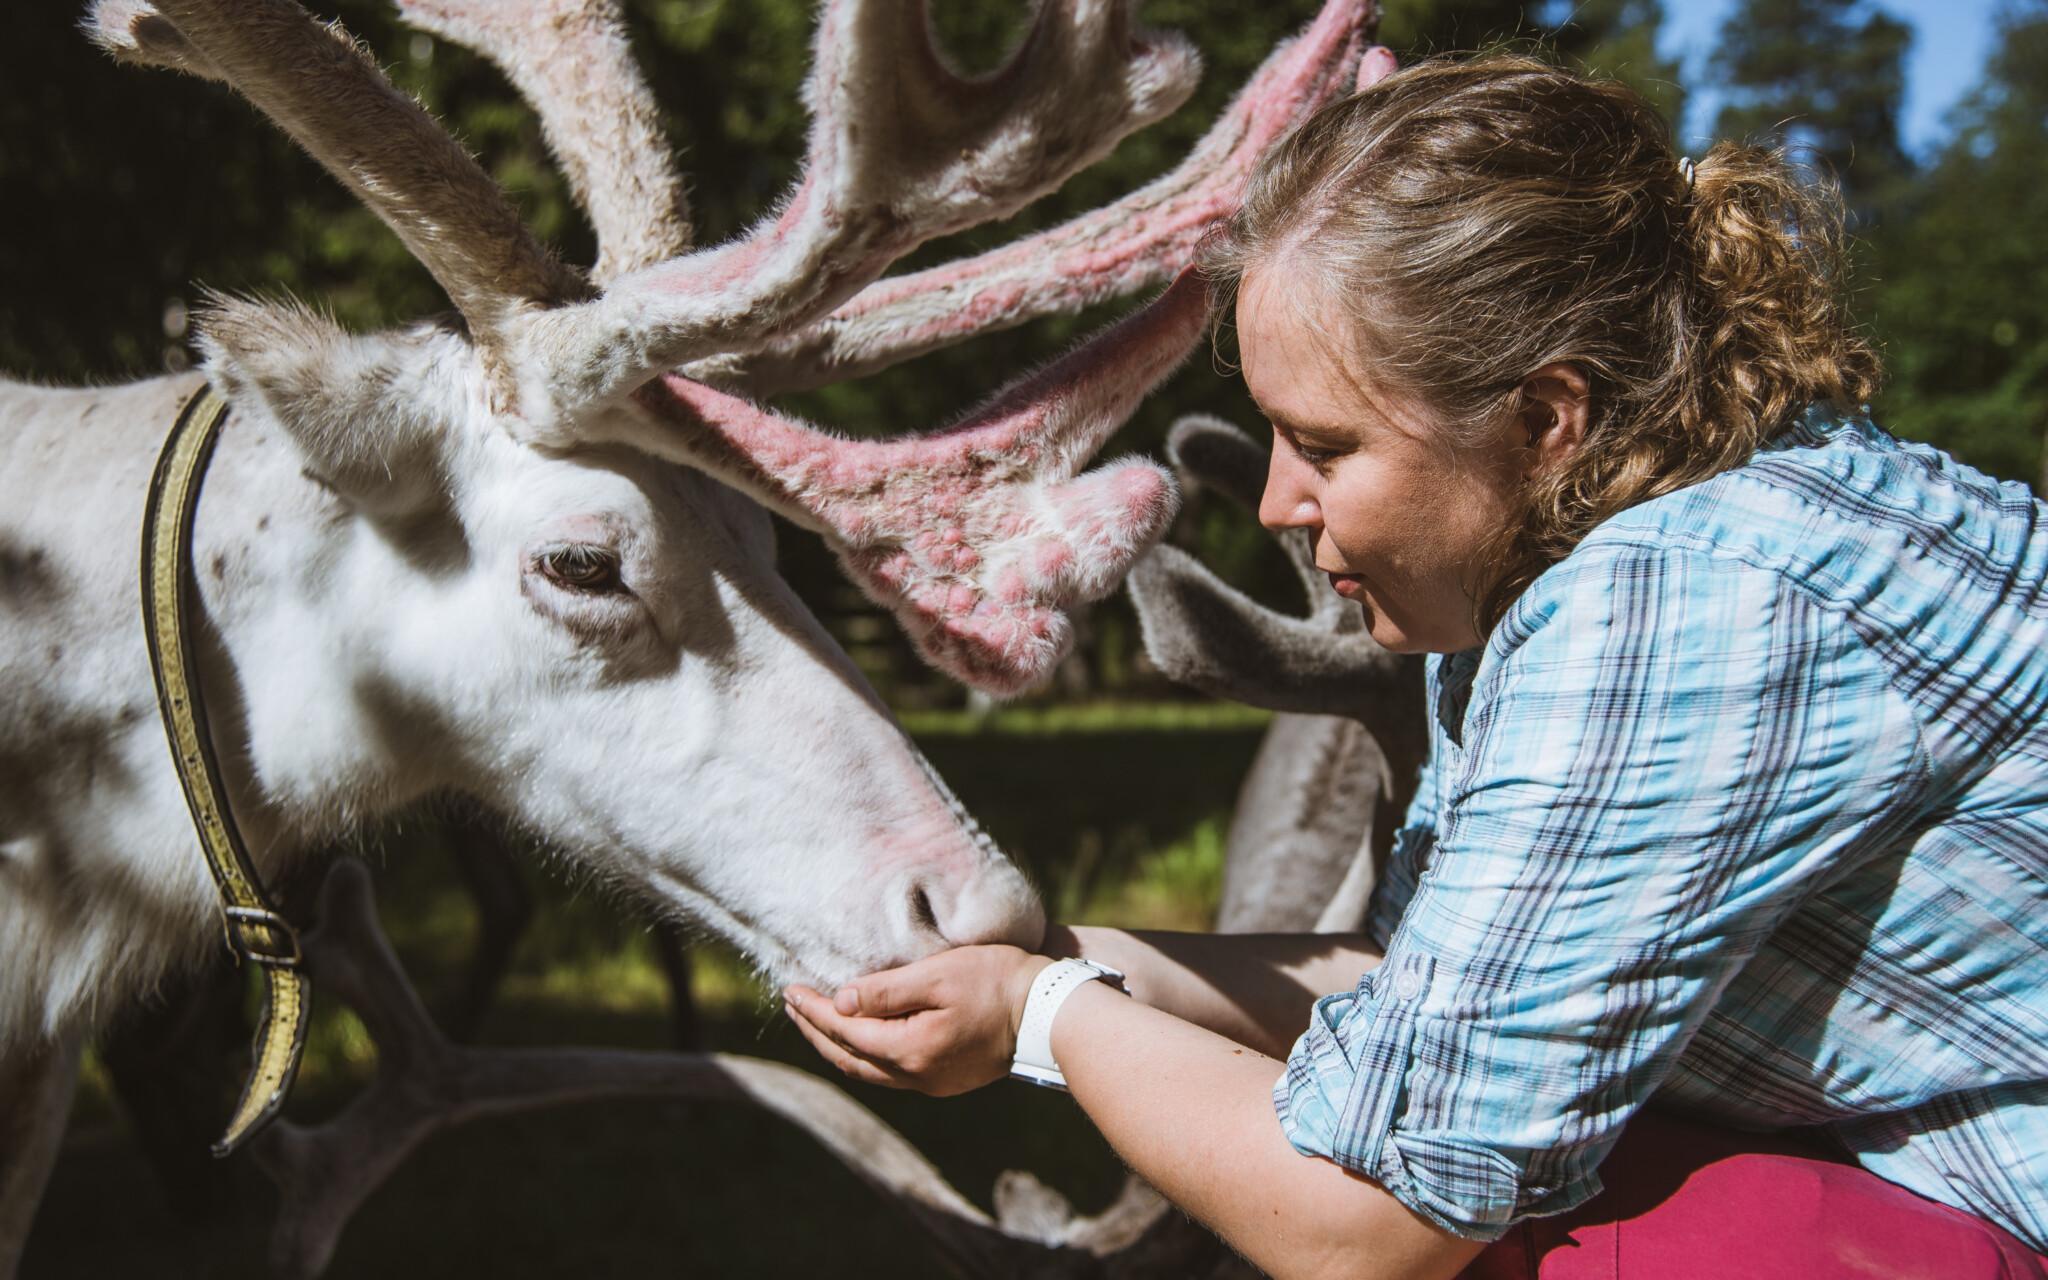 Miia Merkku Year of reindeer Lapland Finland Rovaniemi